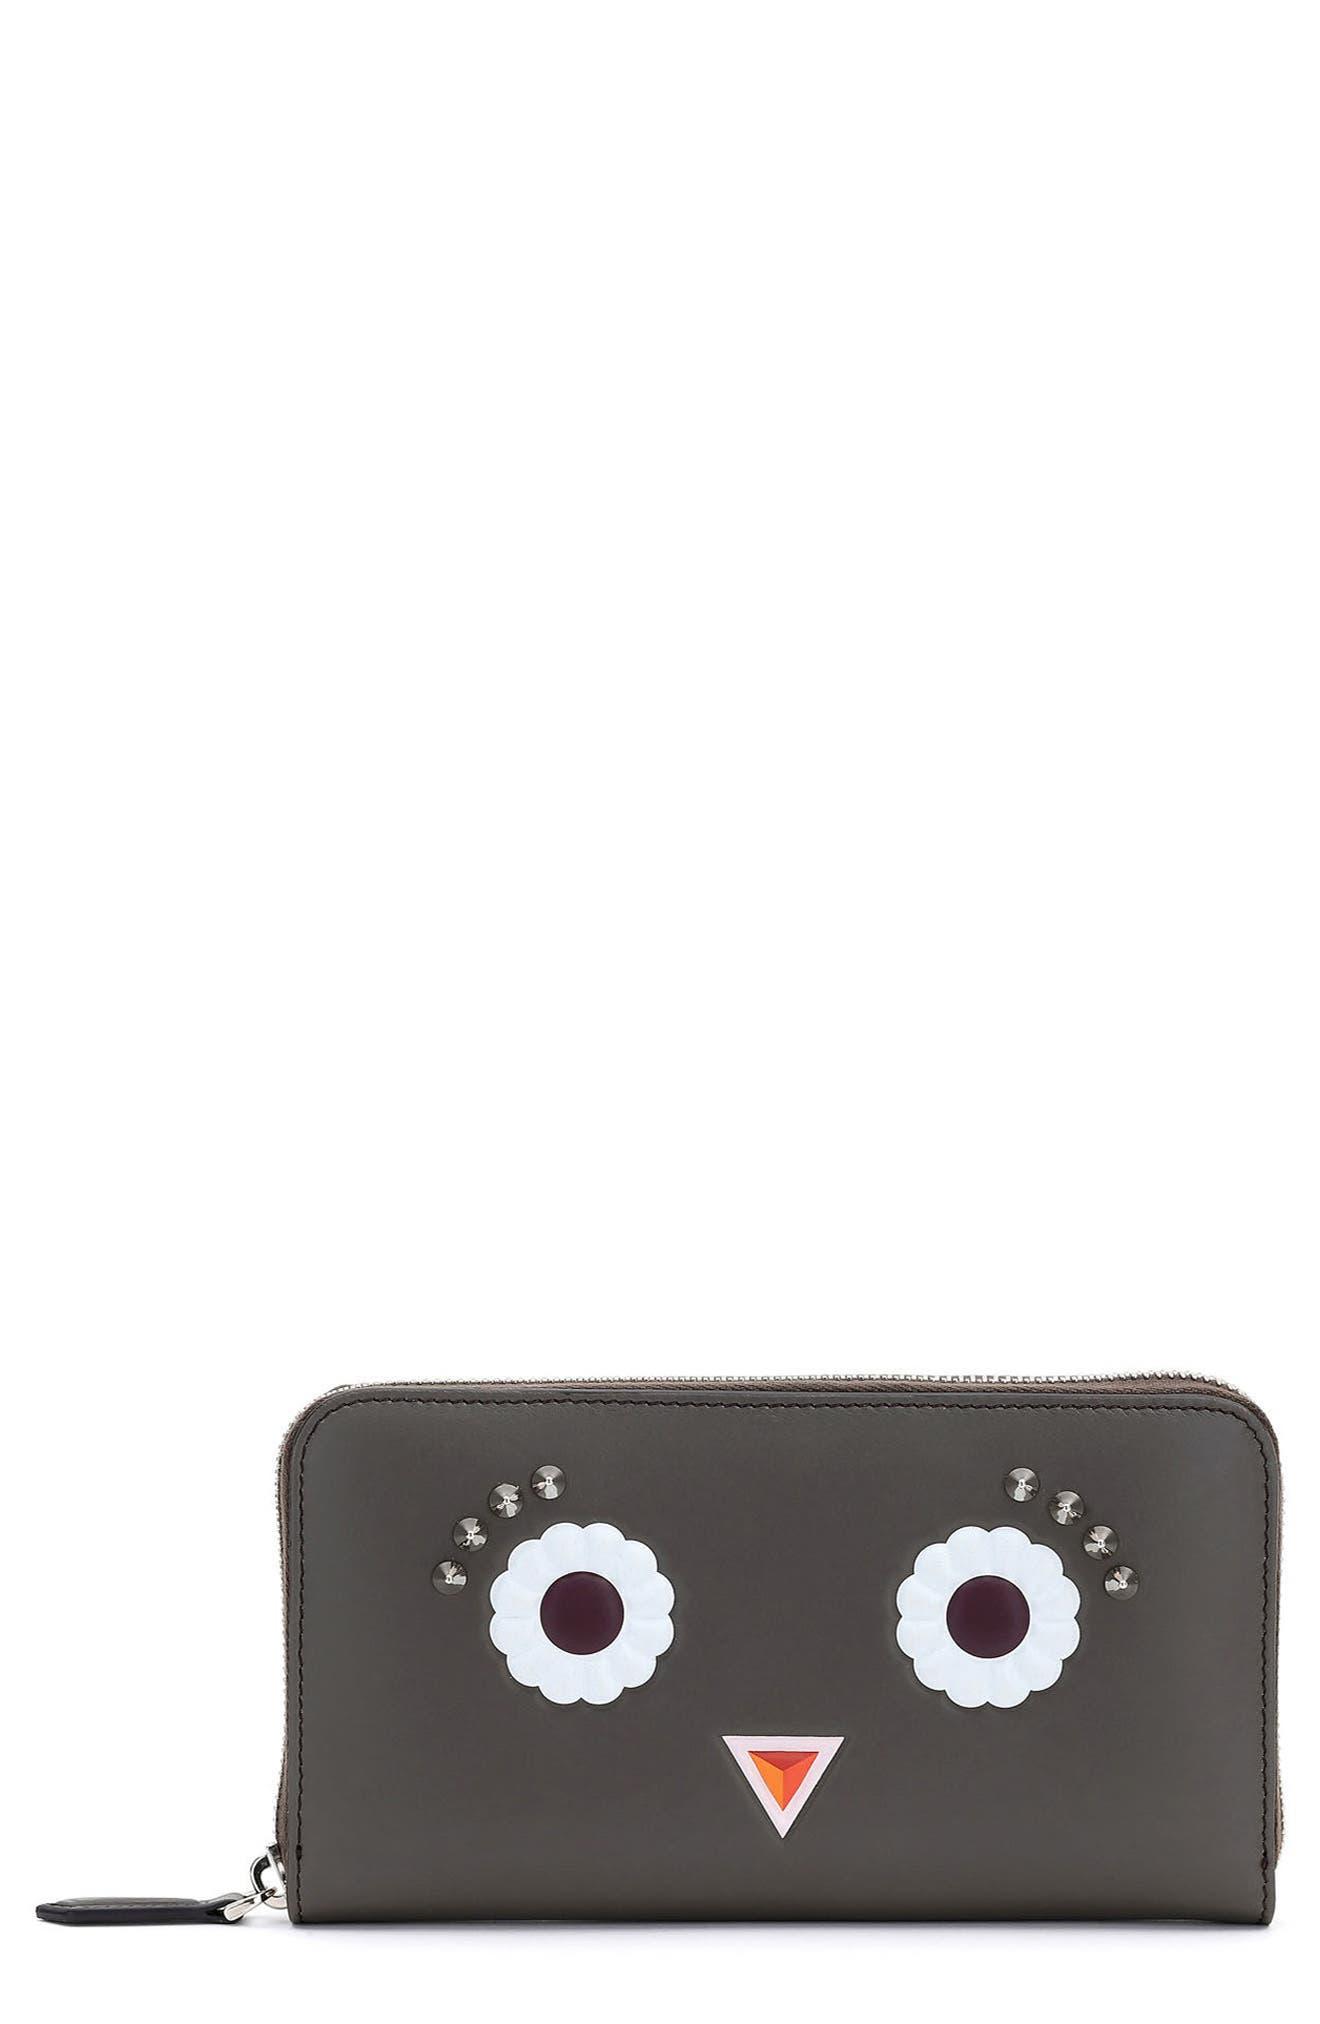 Main Image - Fendi Faces Leather Zip Around Wallet